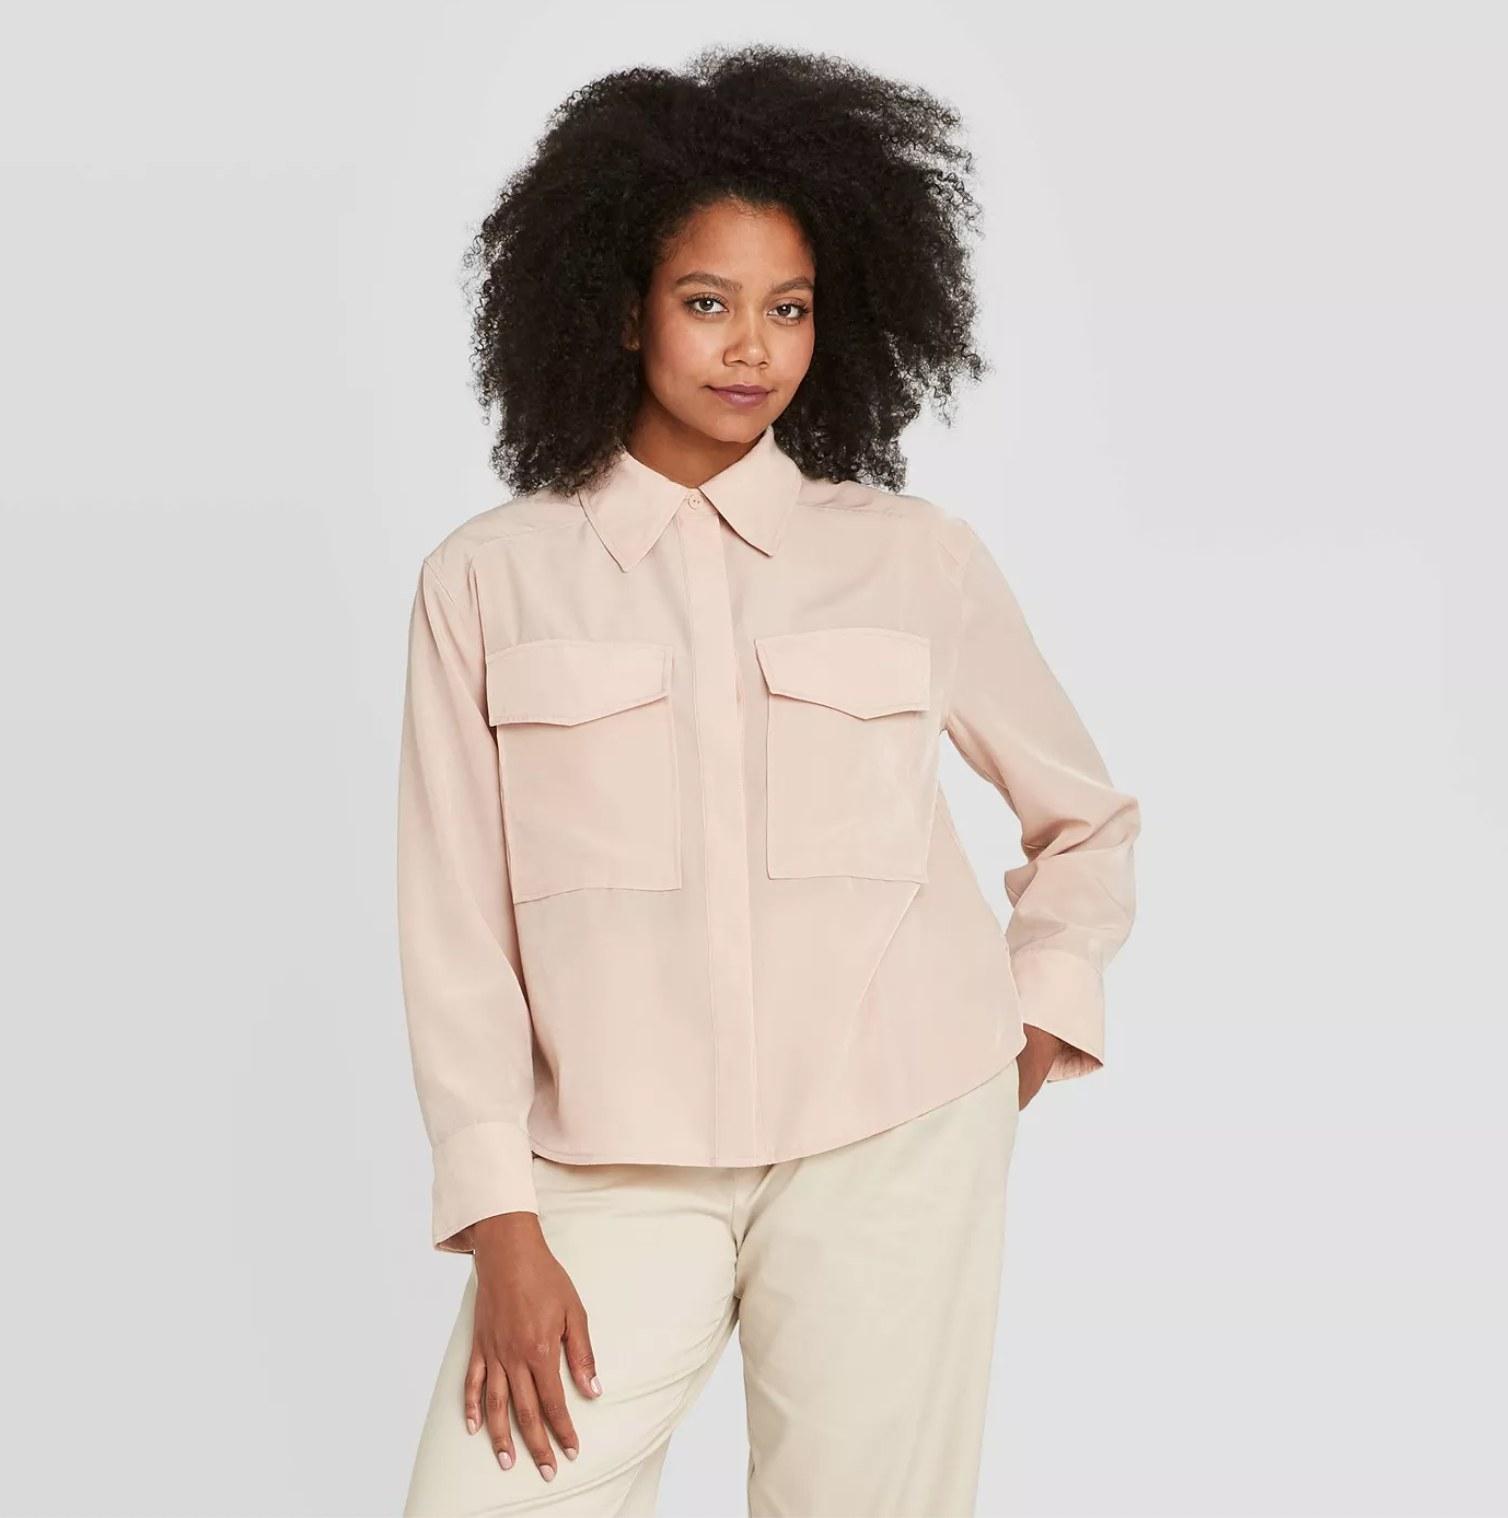 Model wearing the shirt in blush